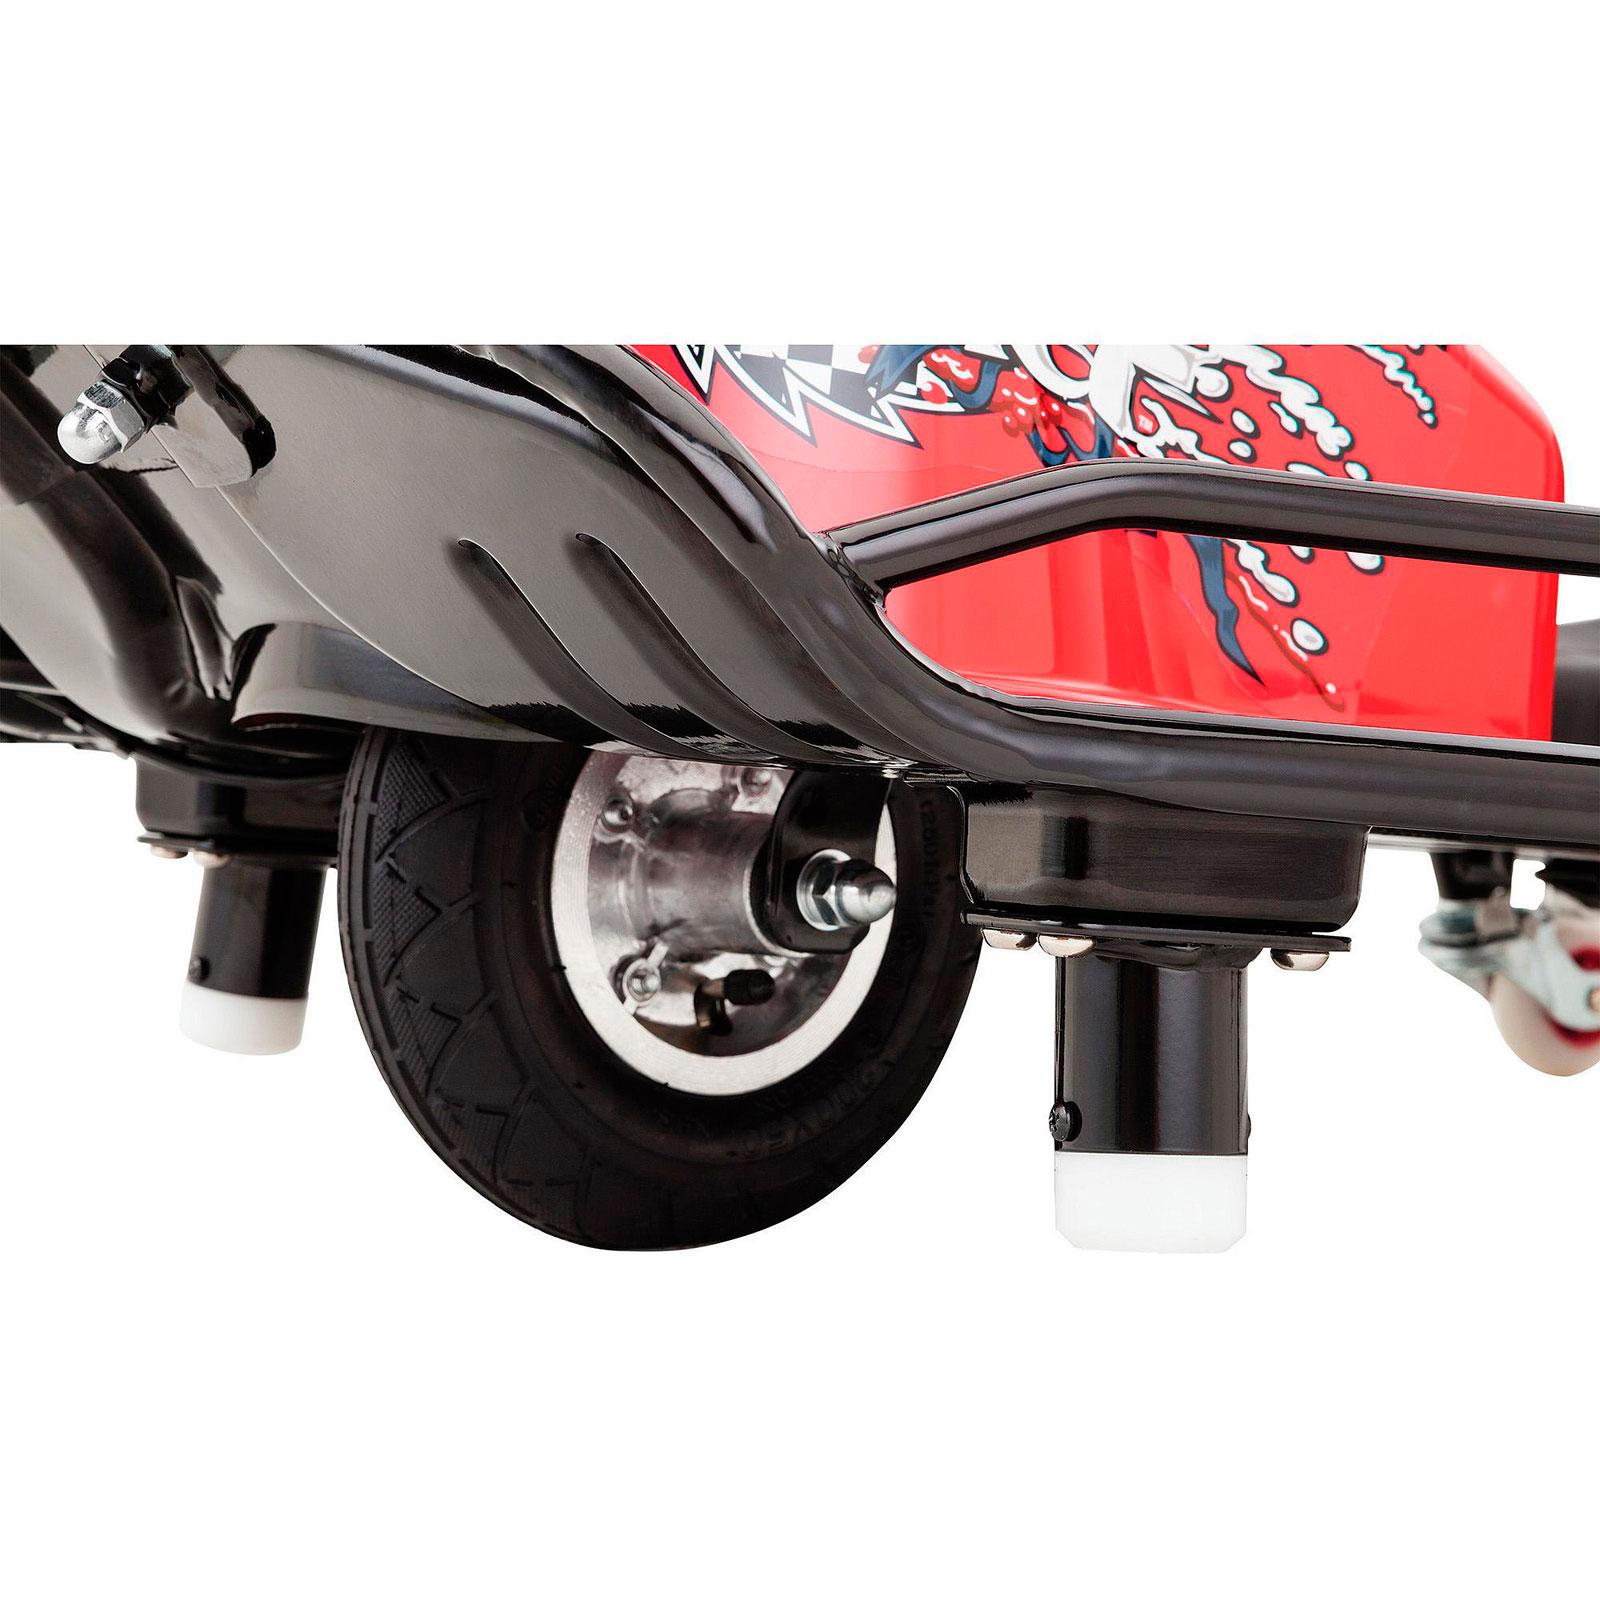 ������� �����-���� ��� ����� Razor Crazy Cart